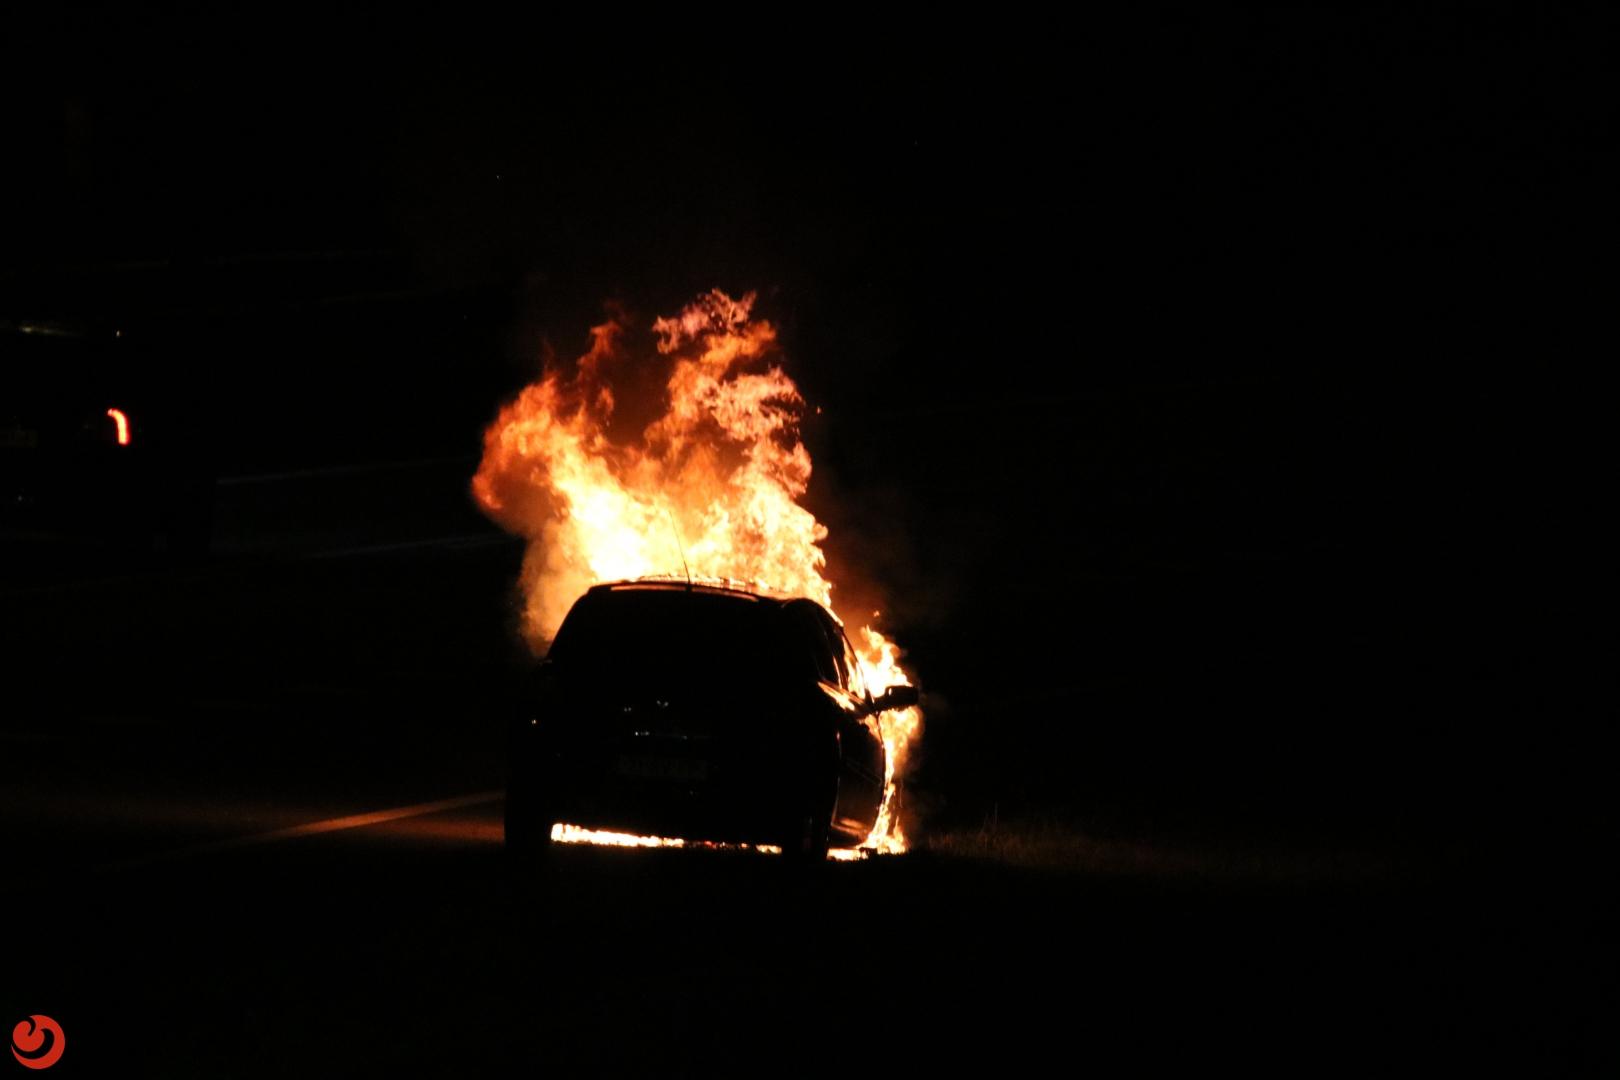 Felle brand verwoest auto op A7